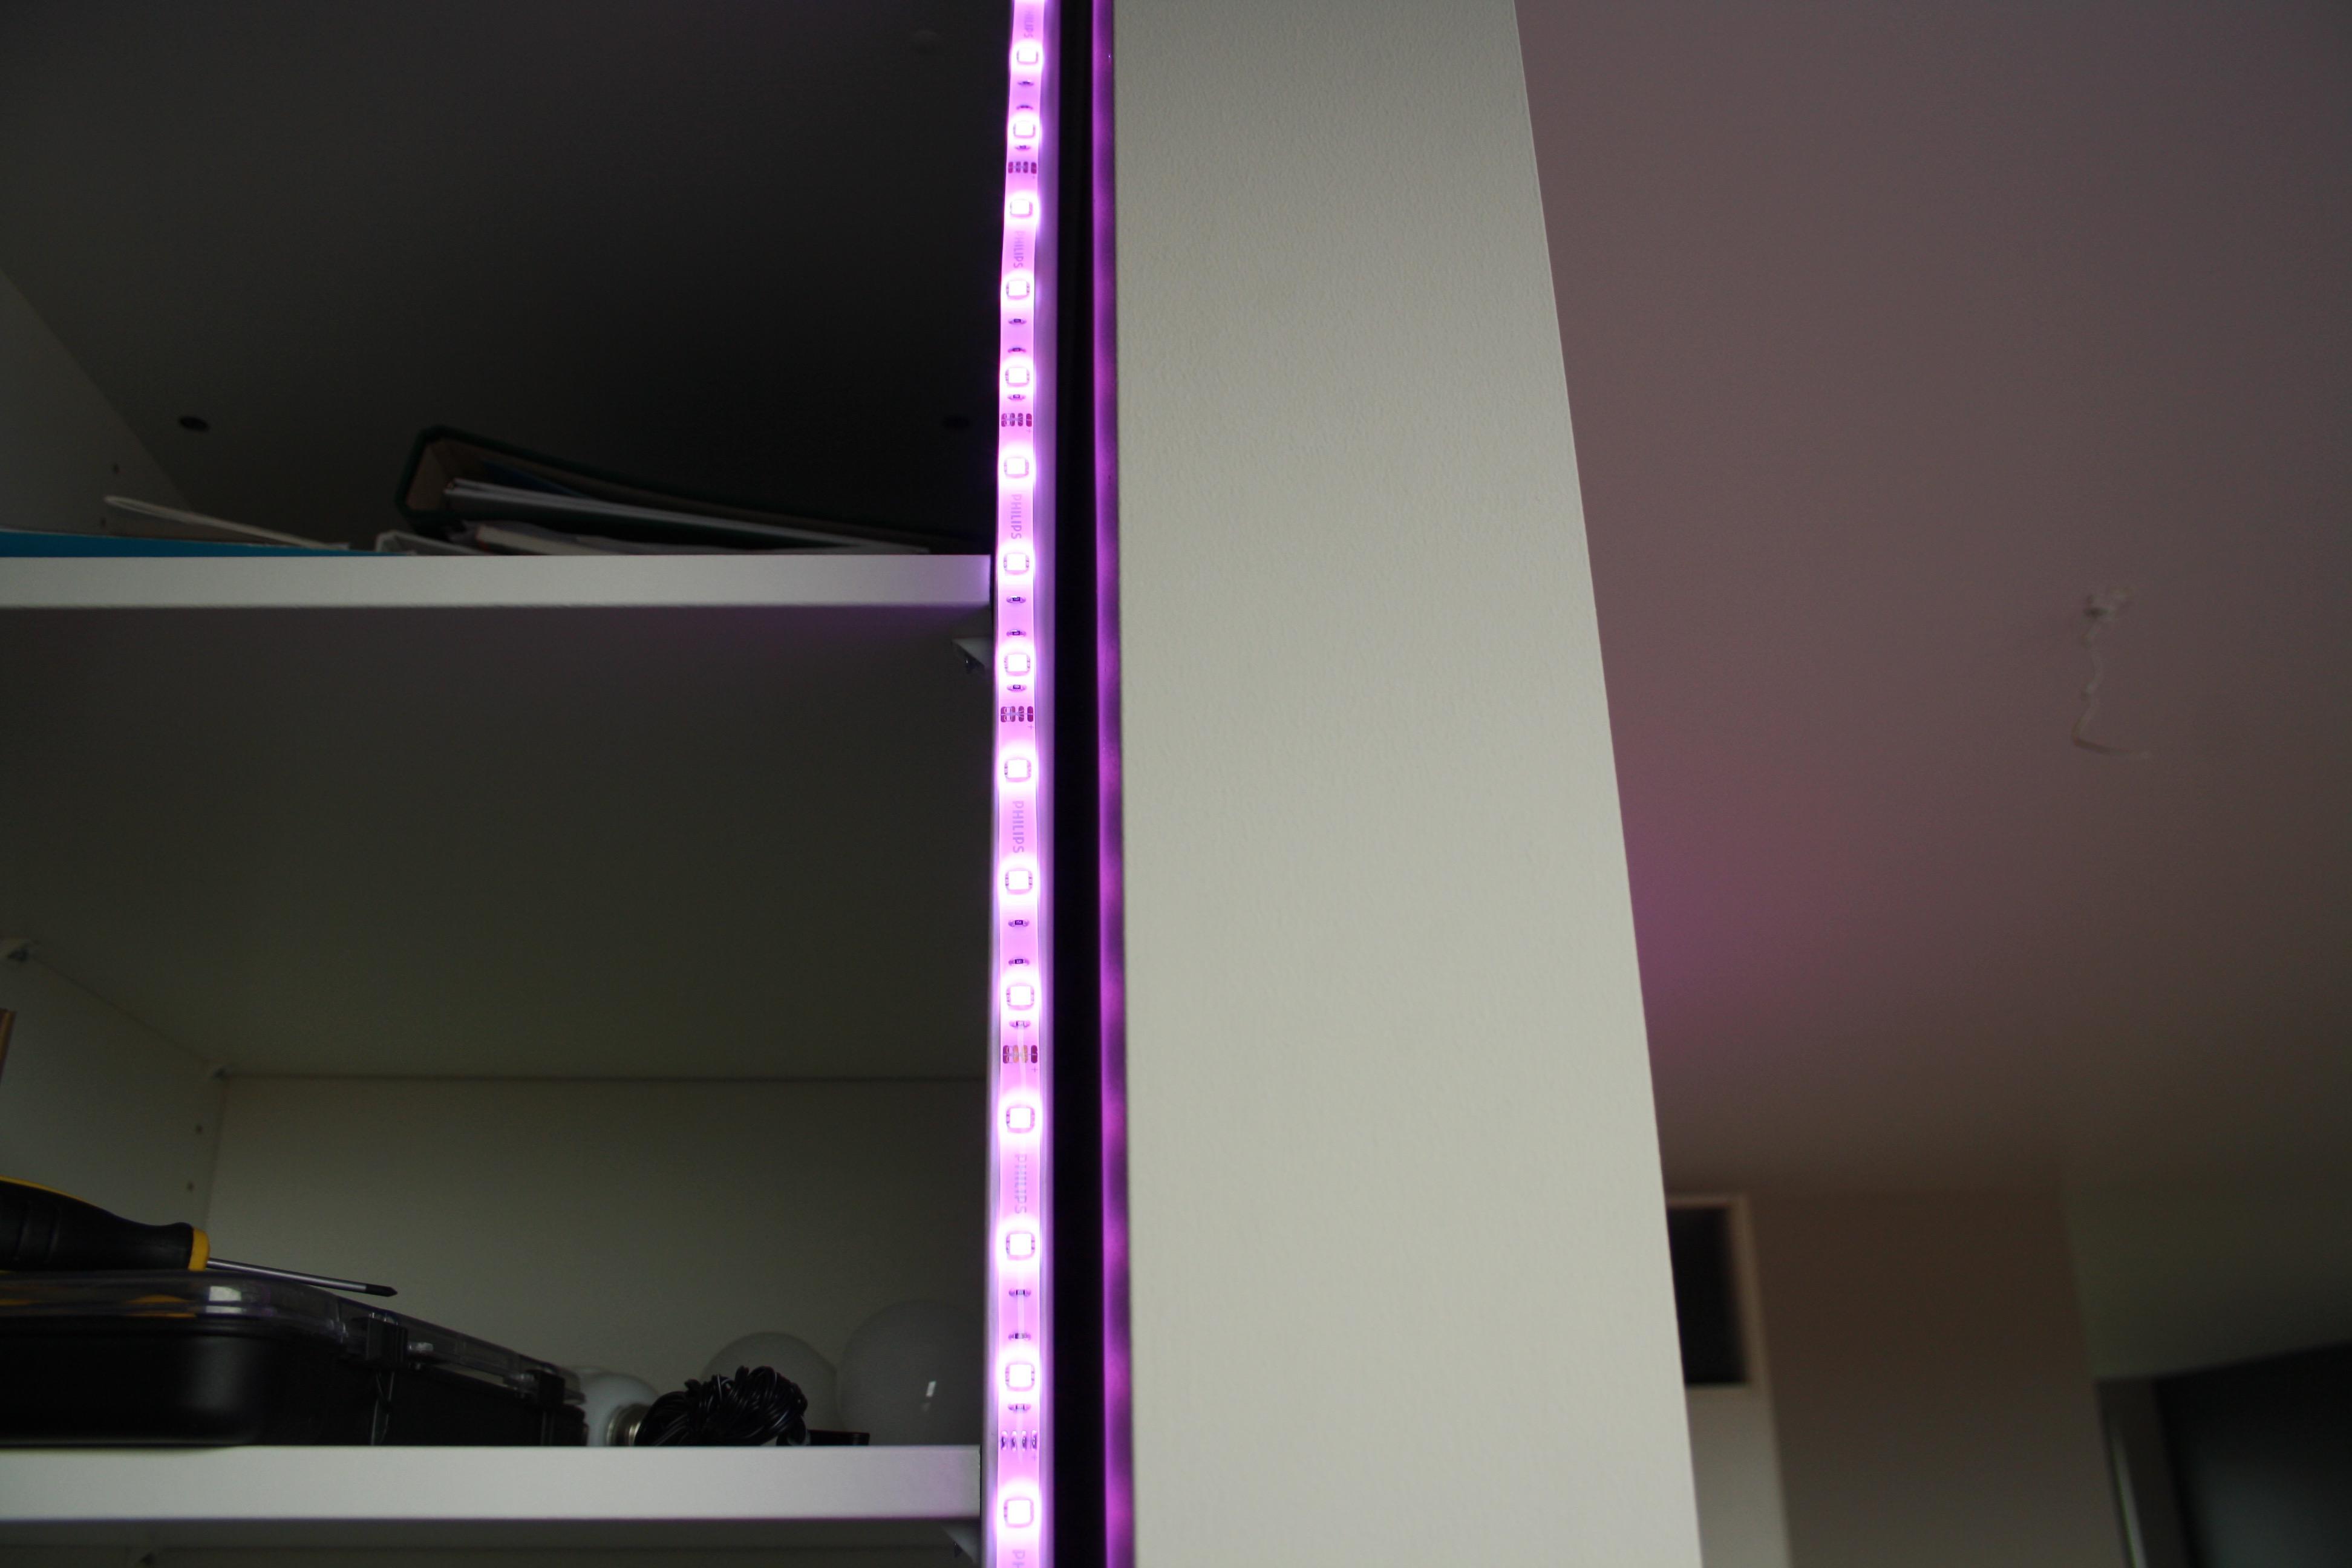 verlichting in kleur philips hue domotica center. Black Bedroom Furniture Sets. Home Design Ideas